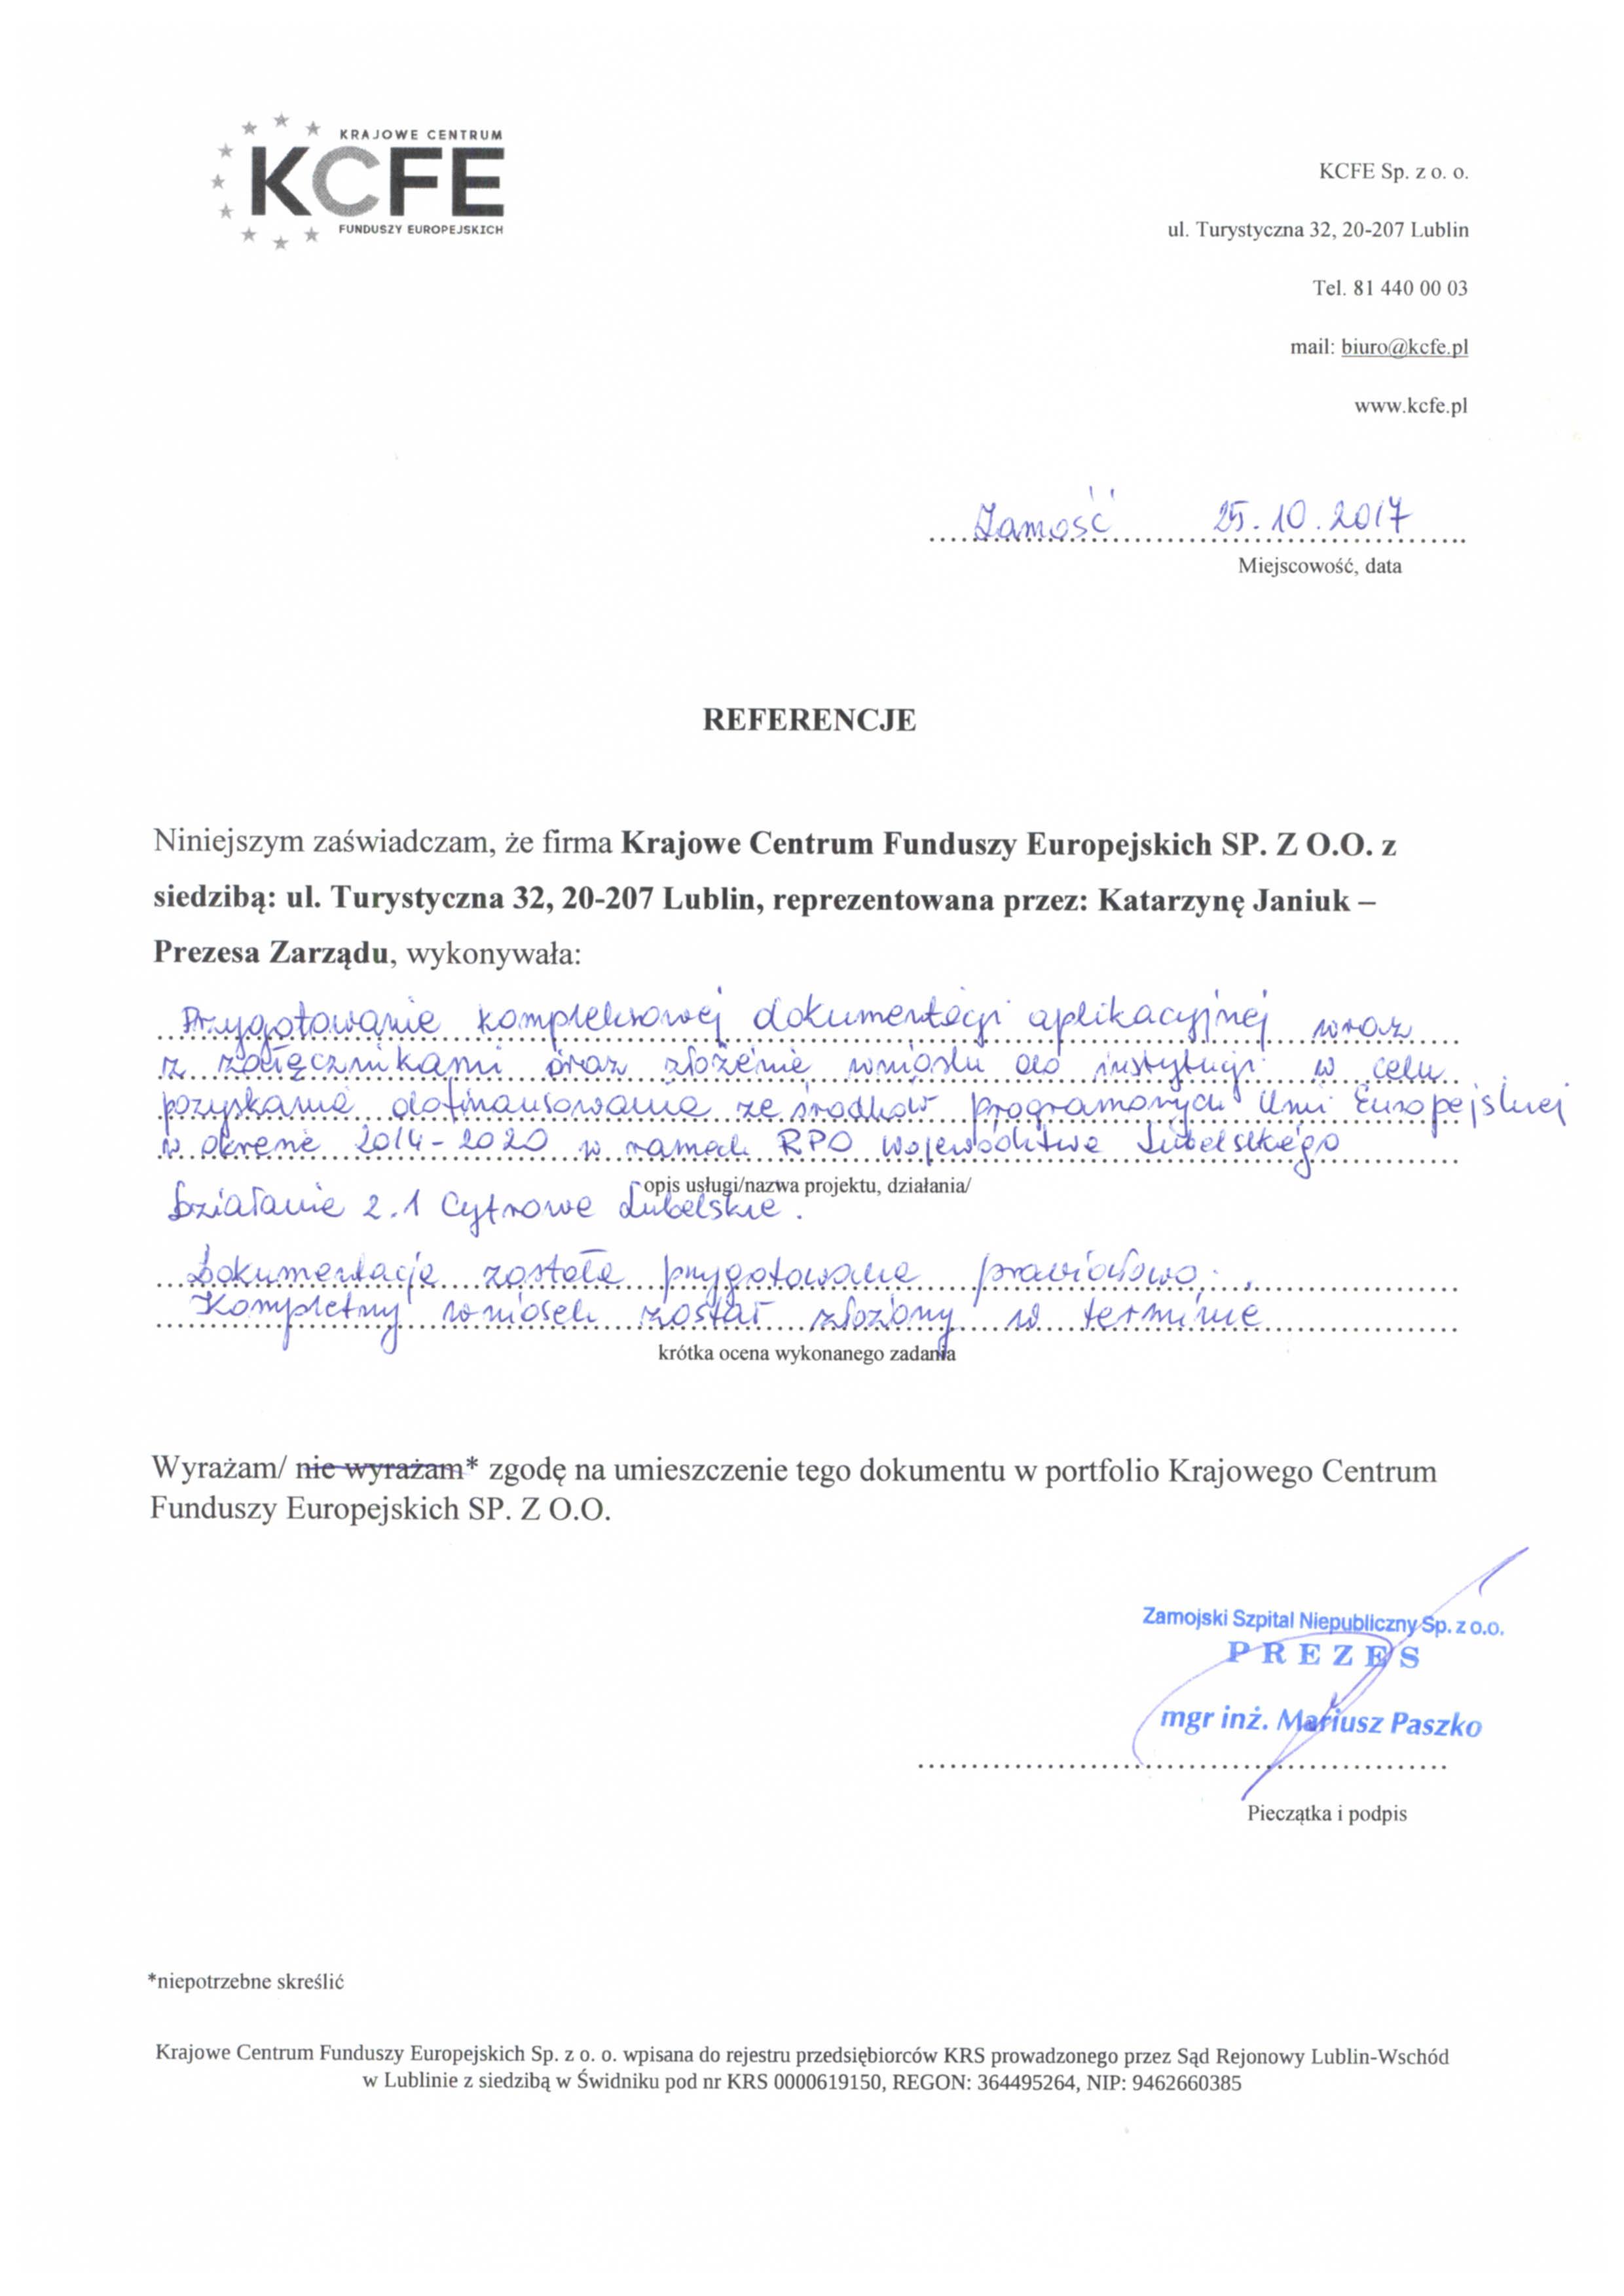 Referencje Zamojski Szpital 25.10.2017 - JPG